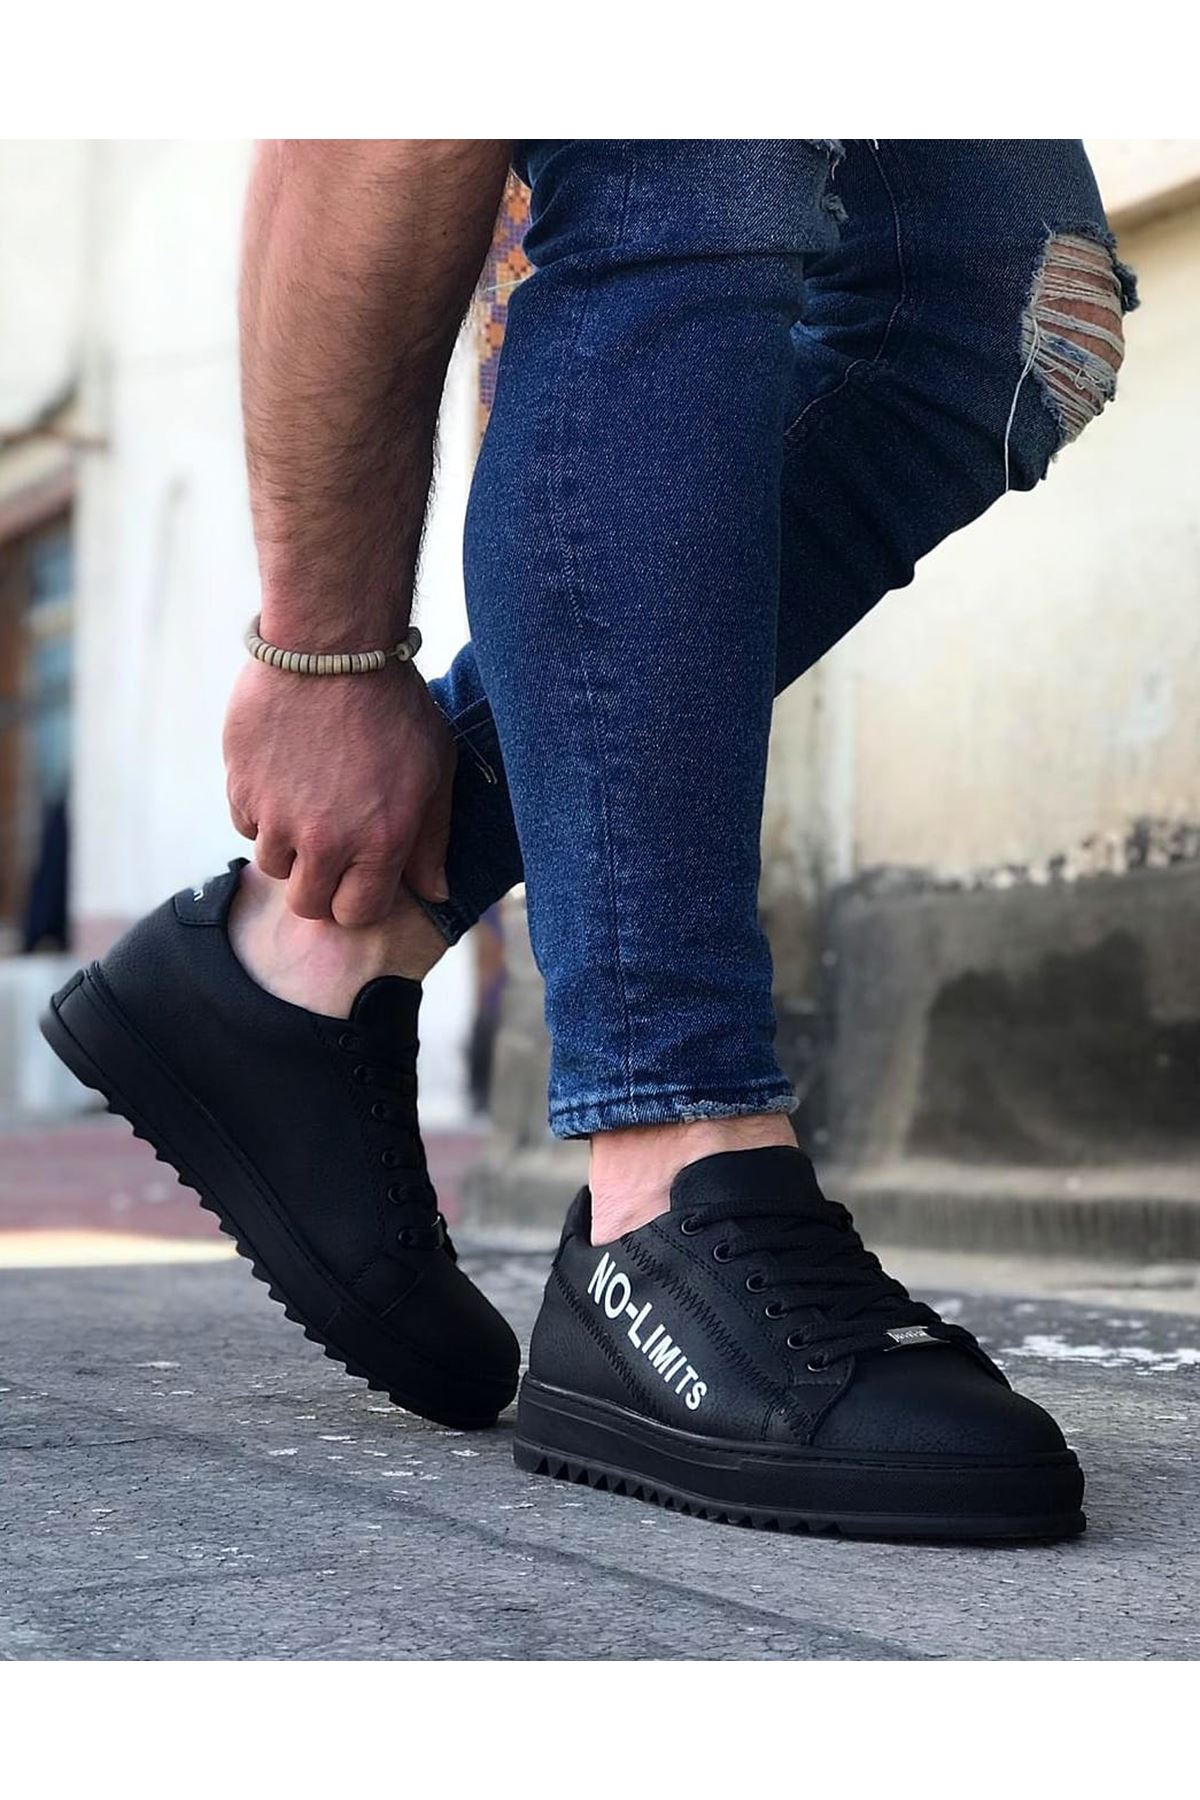 Wagoon WG027 Kömür No Limit Erkek Casual Ayakkabı